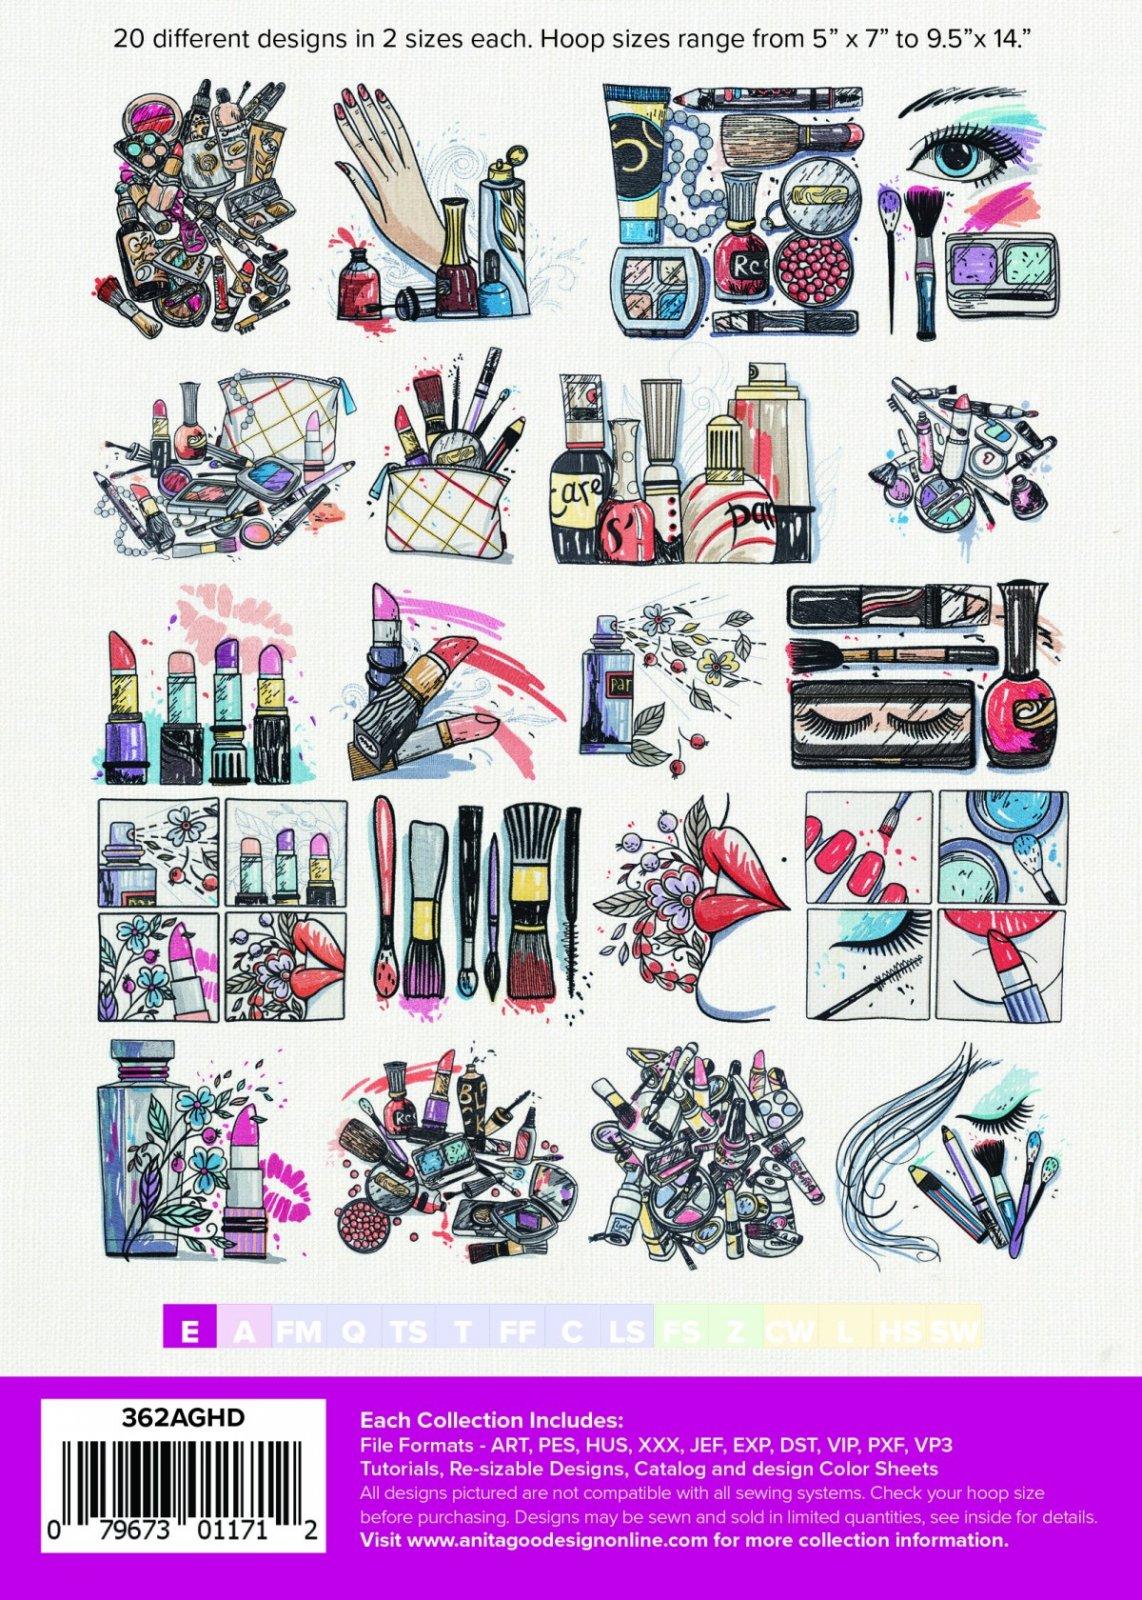 Anita Goodesign: Cosmetic Creations - 079673011712